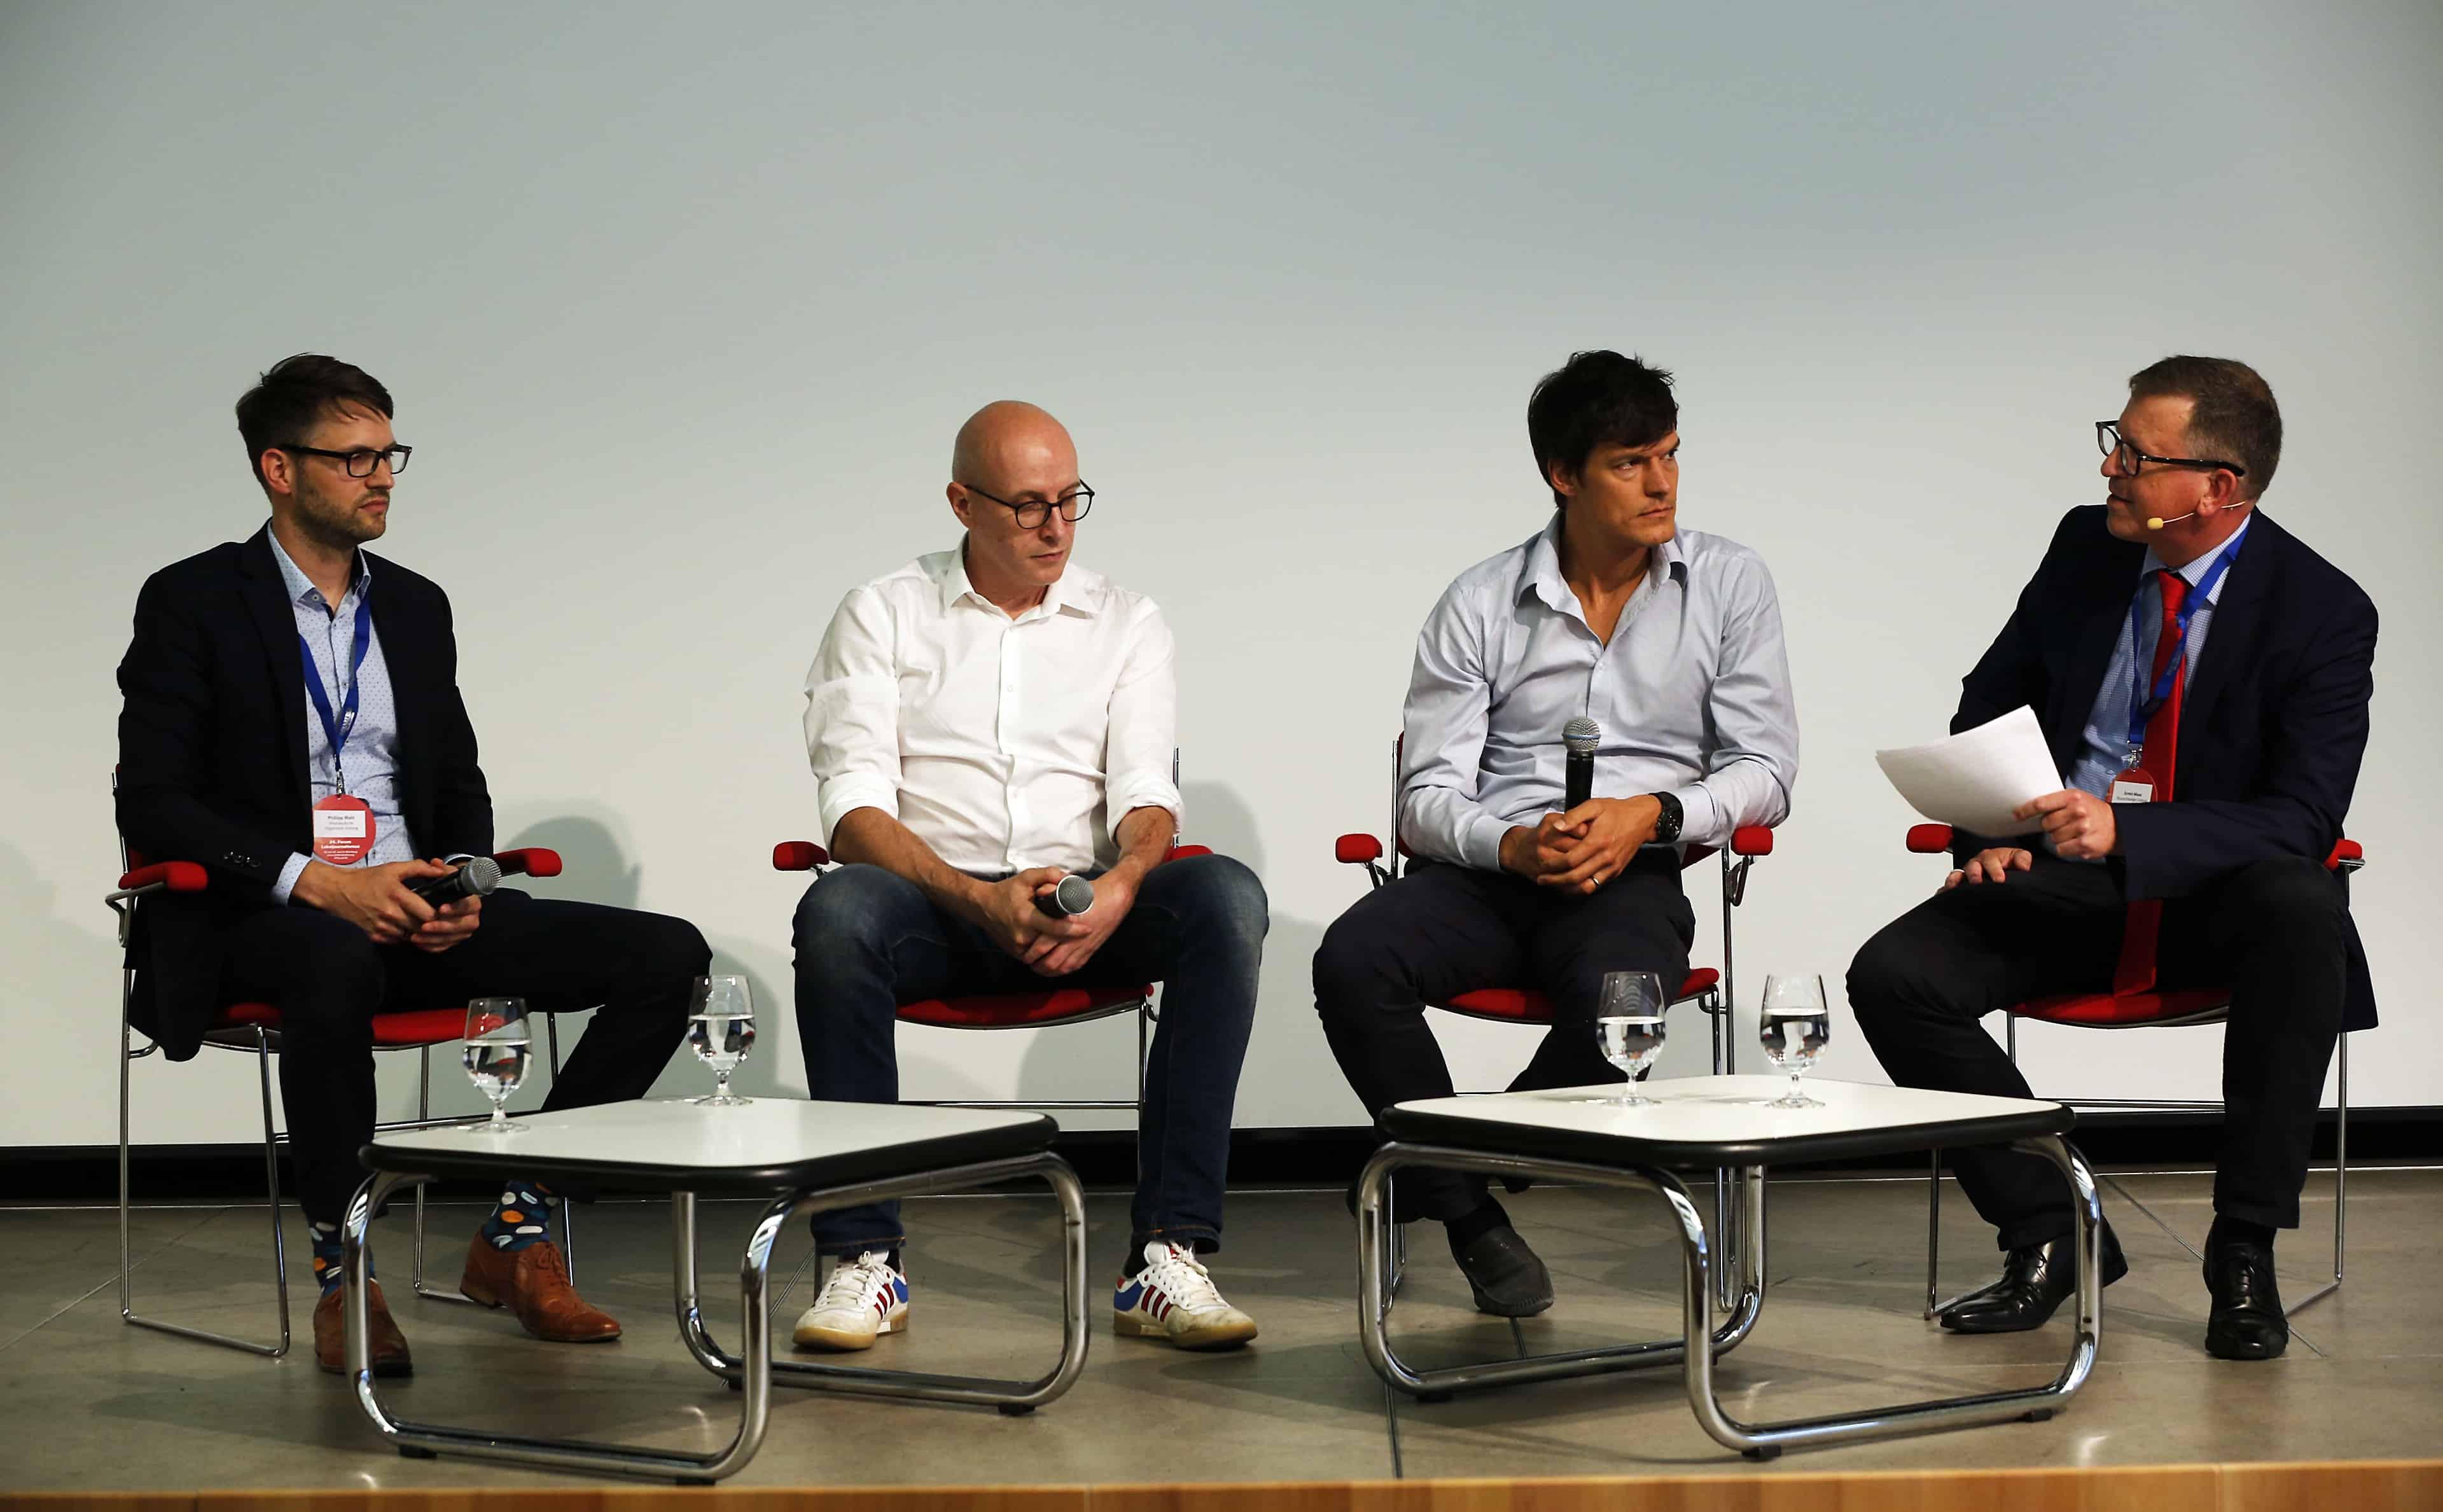 Thema Hyperlokales (v.l.n.r.): Philipp Wahl (WAZ), Daniel Steil (Focus Online), Christian Vollmann (Nebenan.de), und Moderator Armin Maus